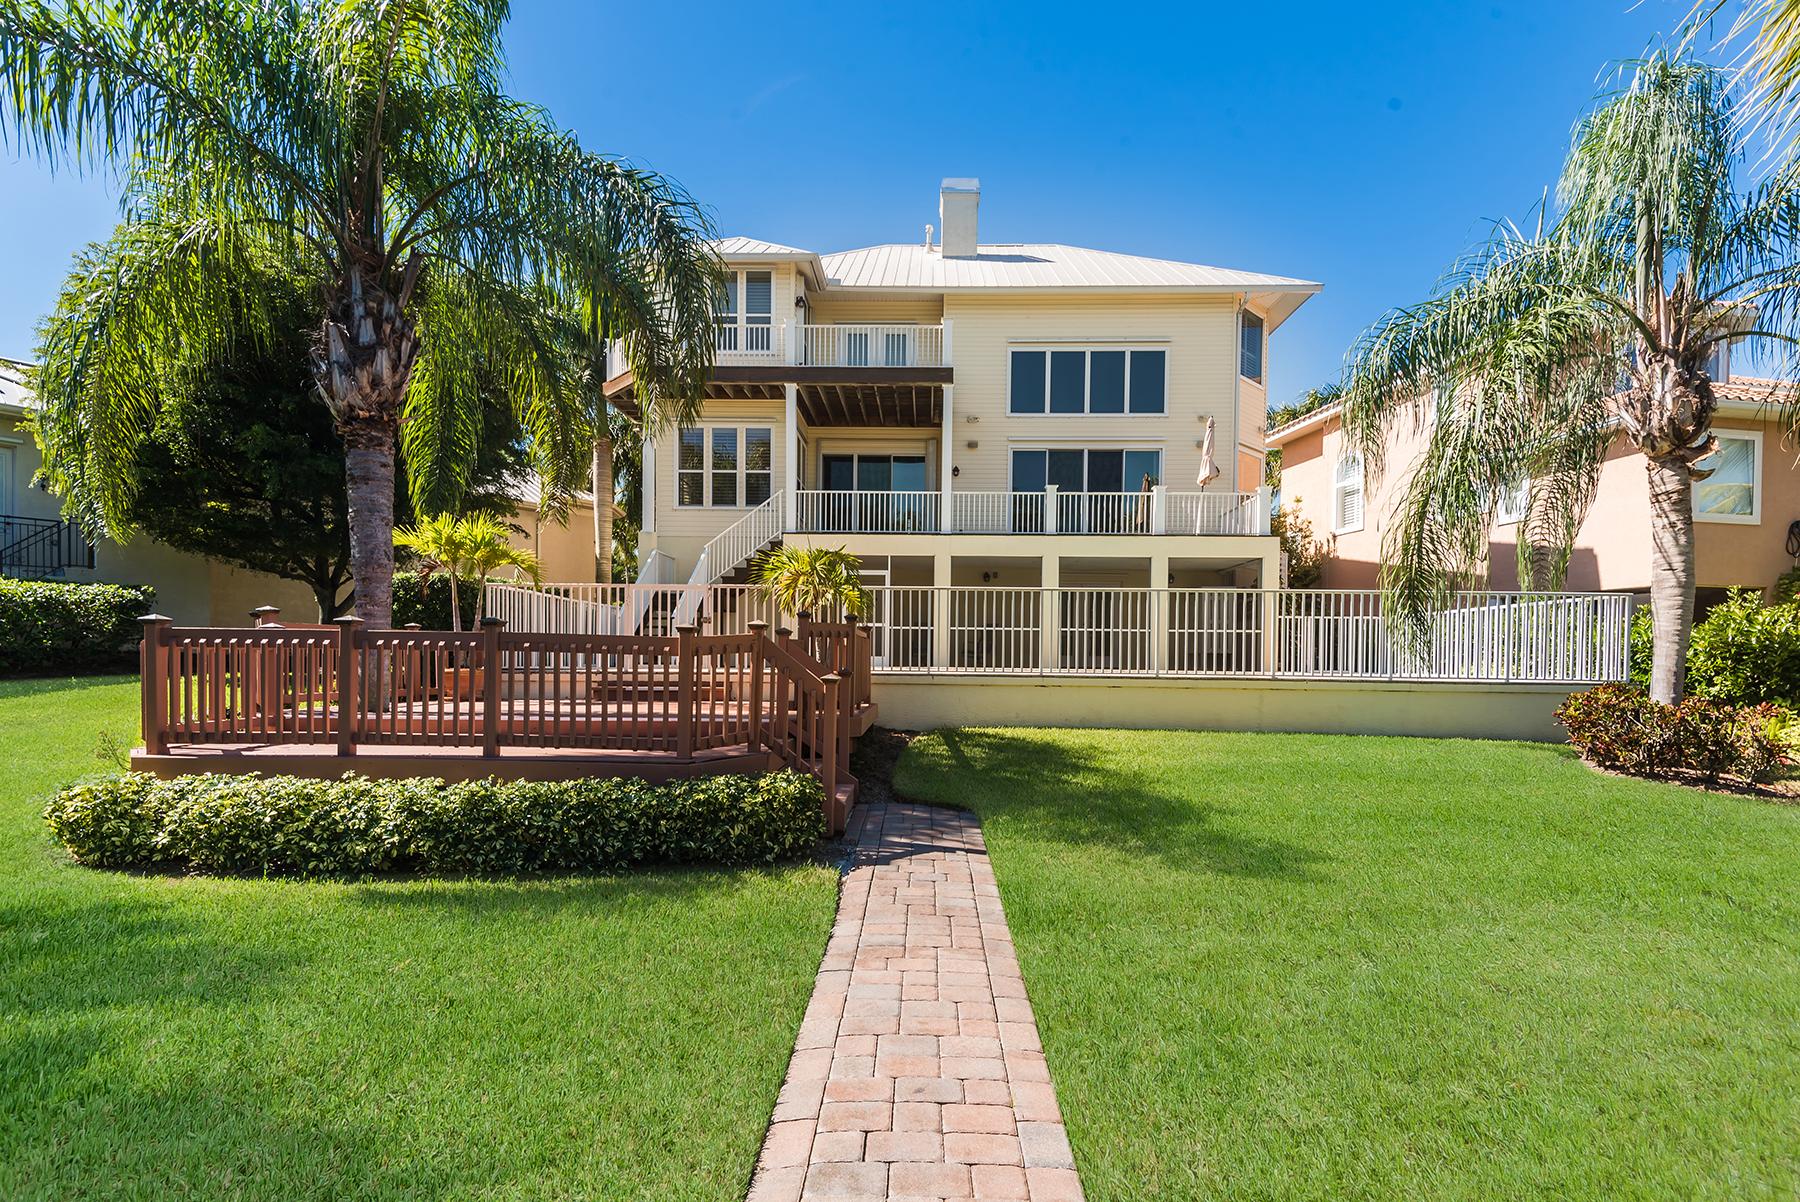 獨棟家庭住宅 為 出售 在 HAWKS HARBOR 7114 Hawks Harbor Cir Bradenton, 佛羅里達州, 34207 美國